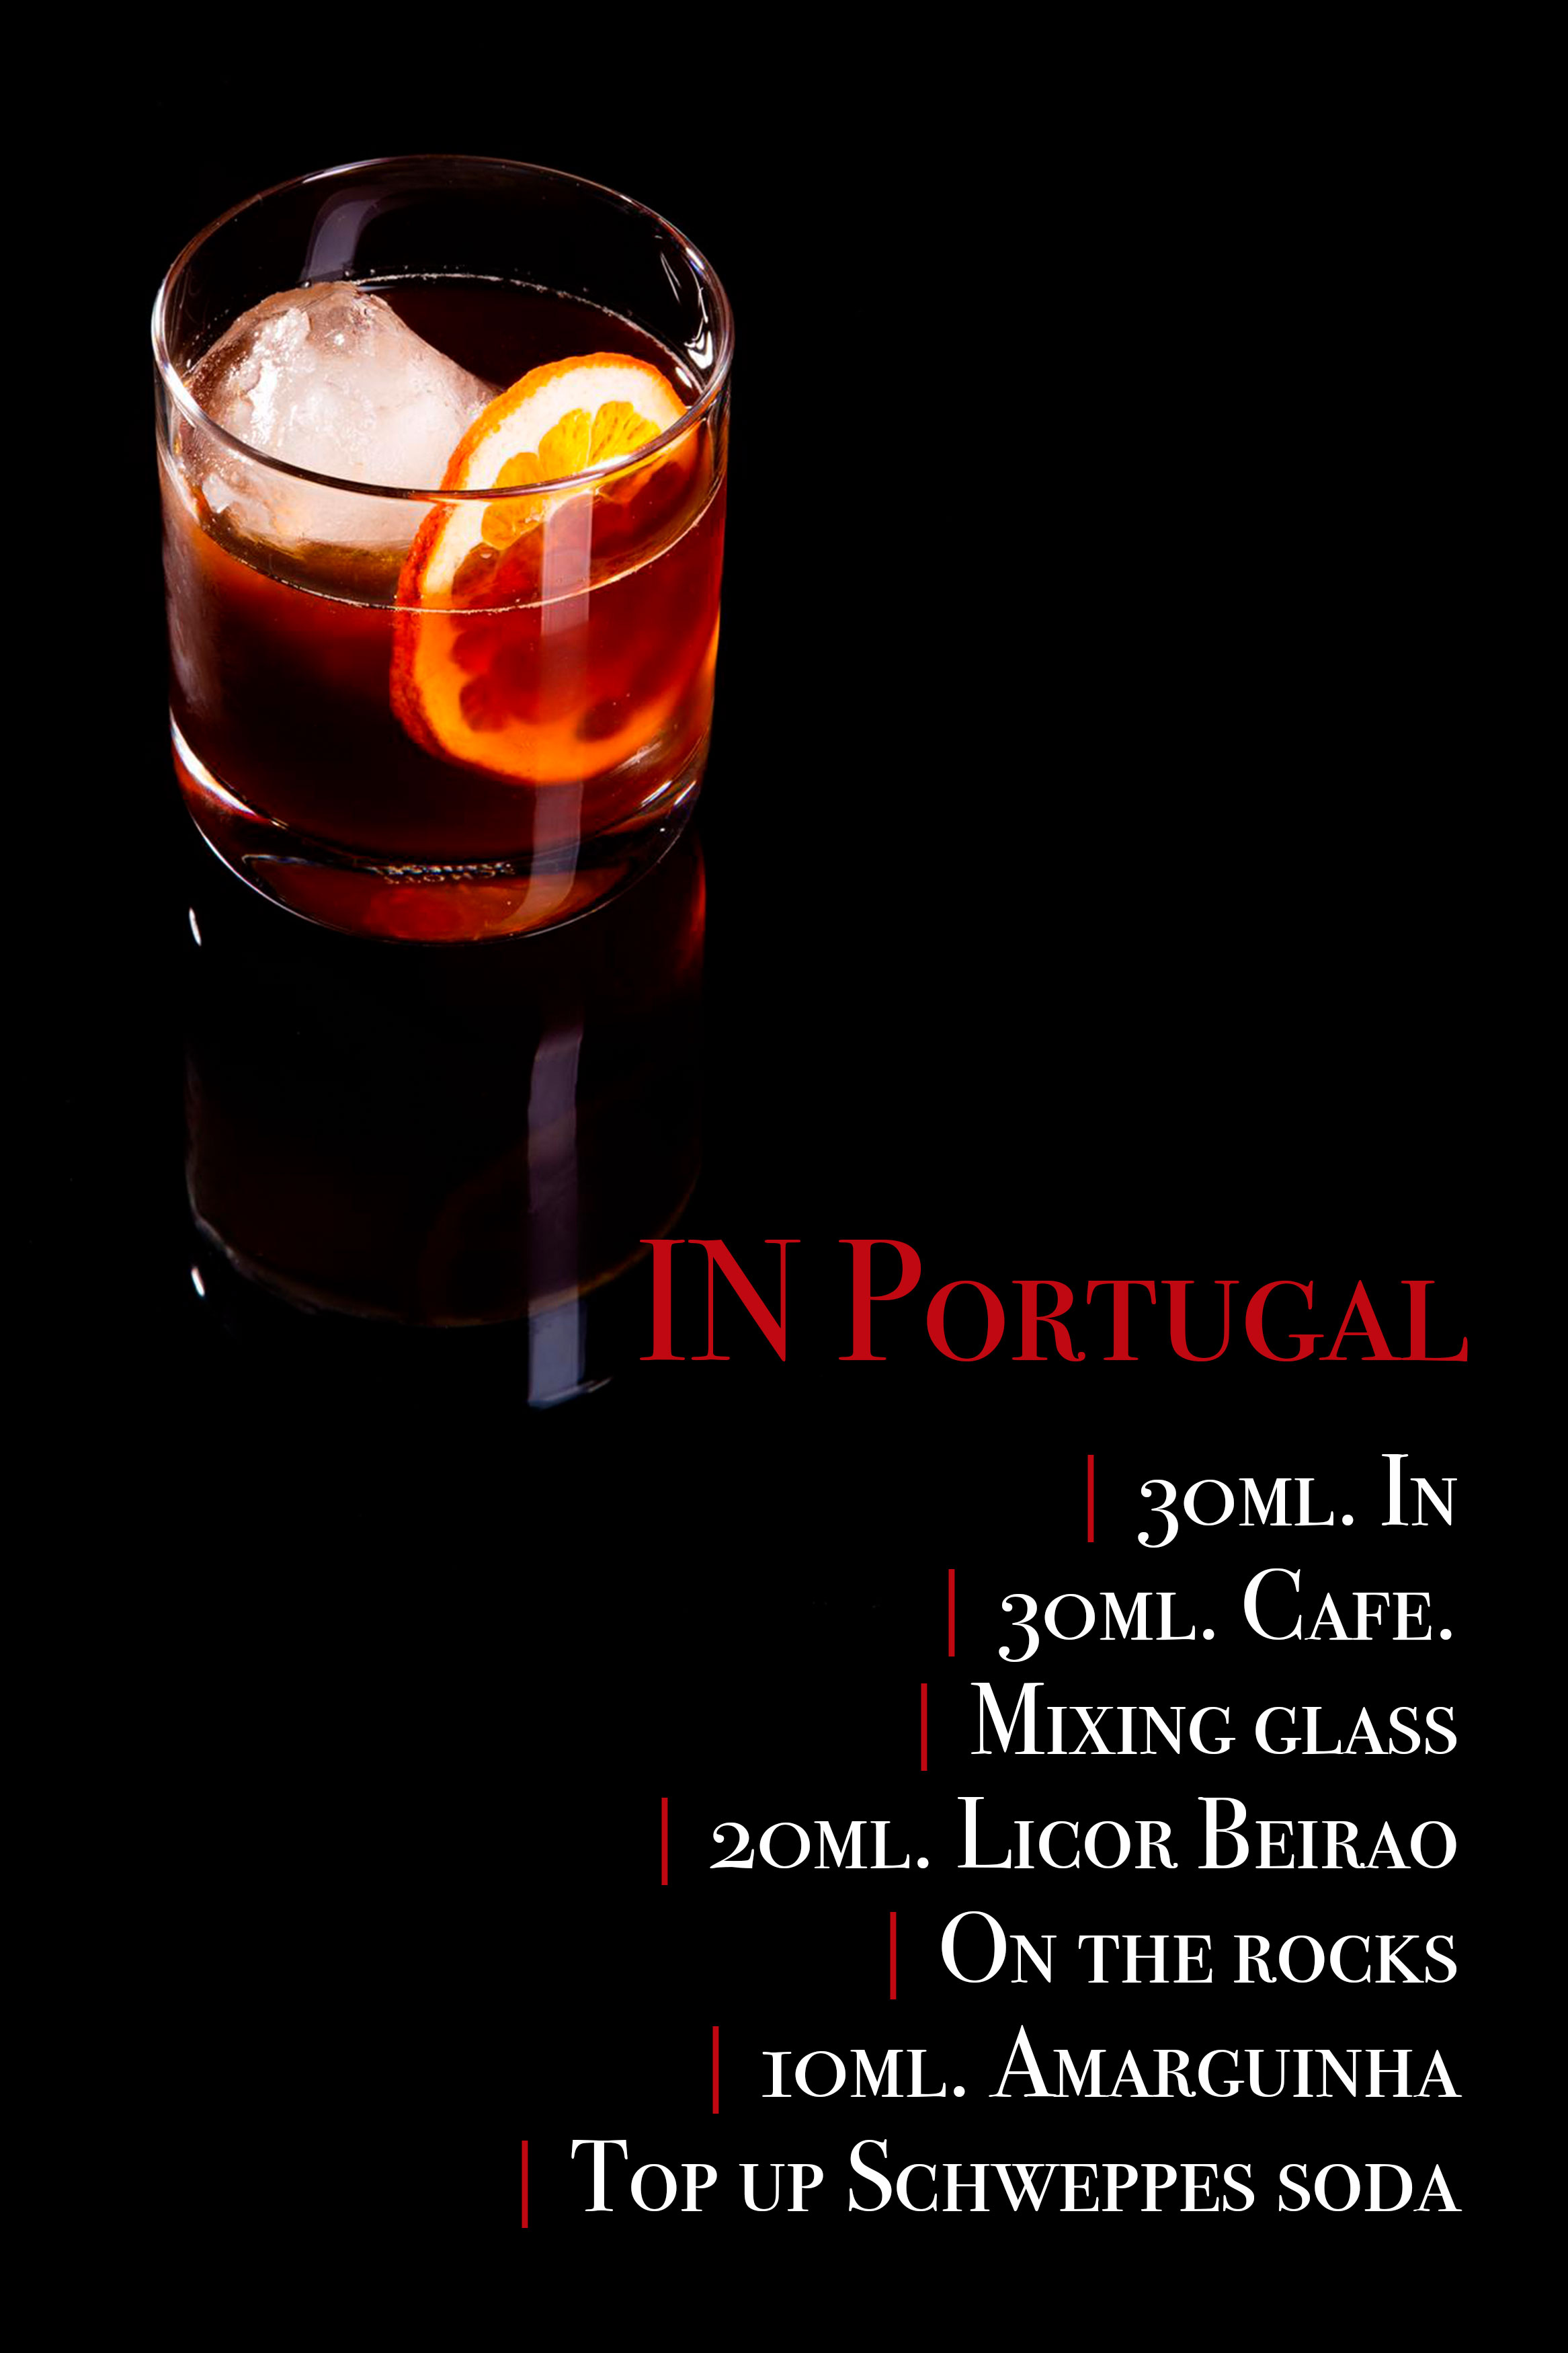 IN-portugal_2